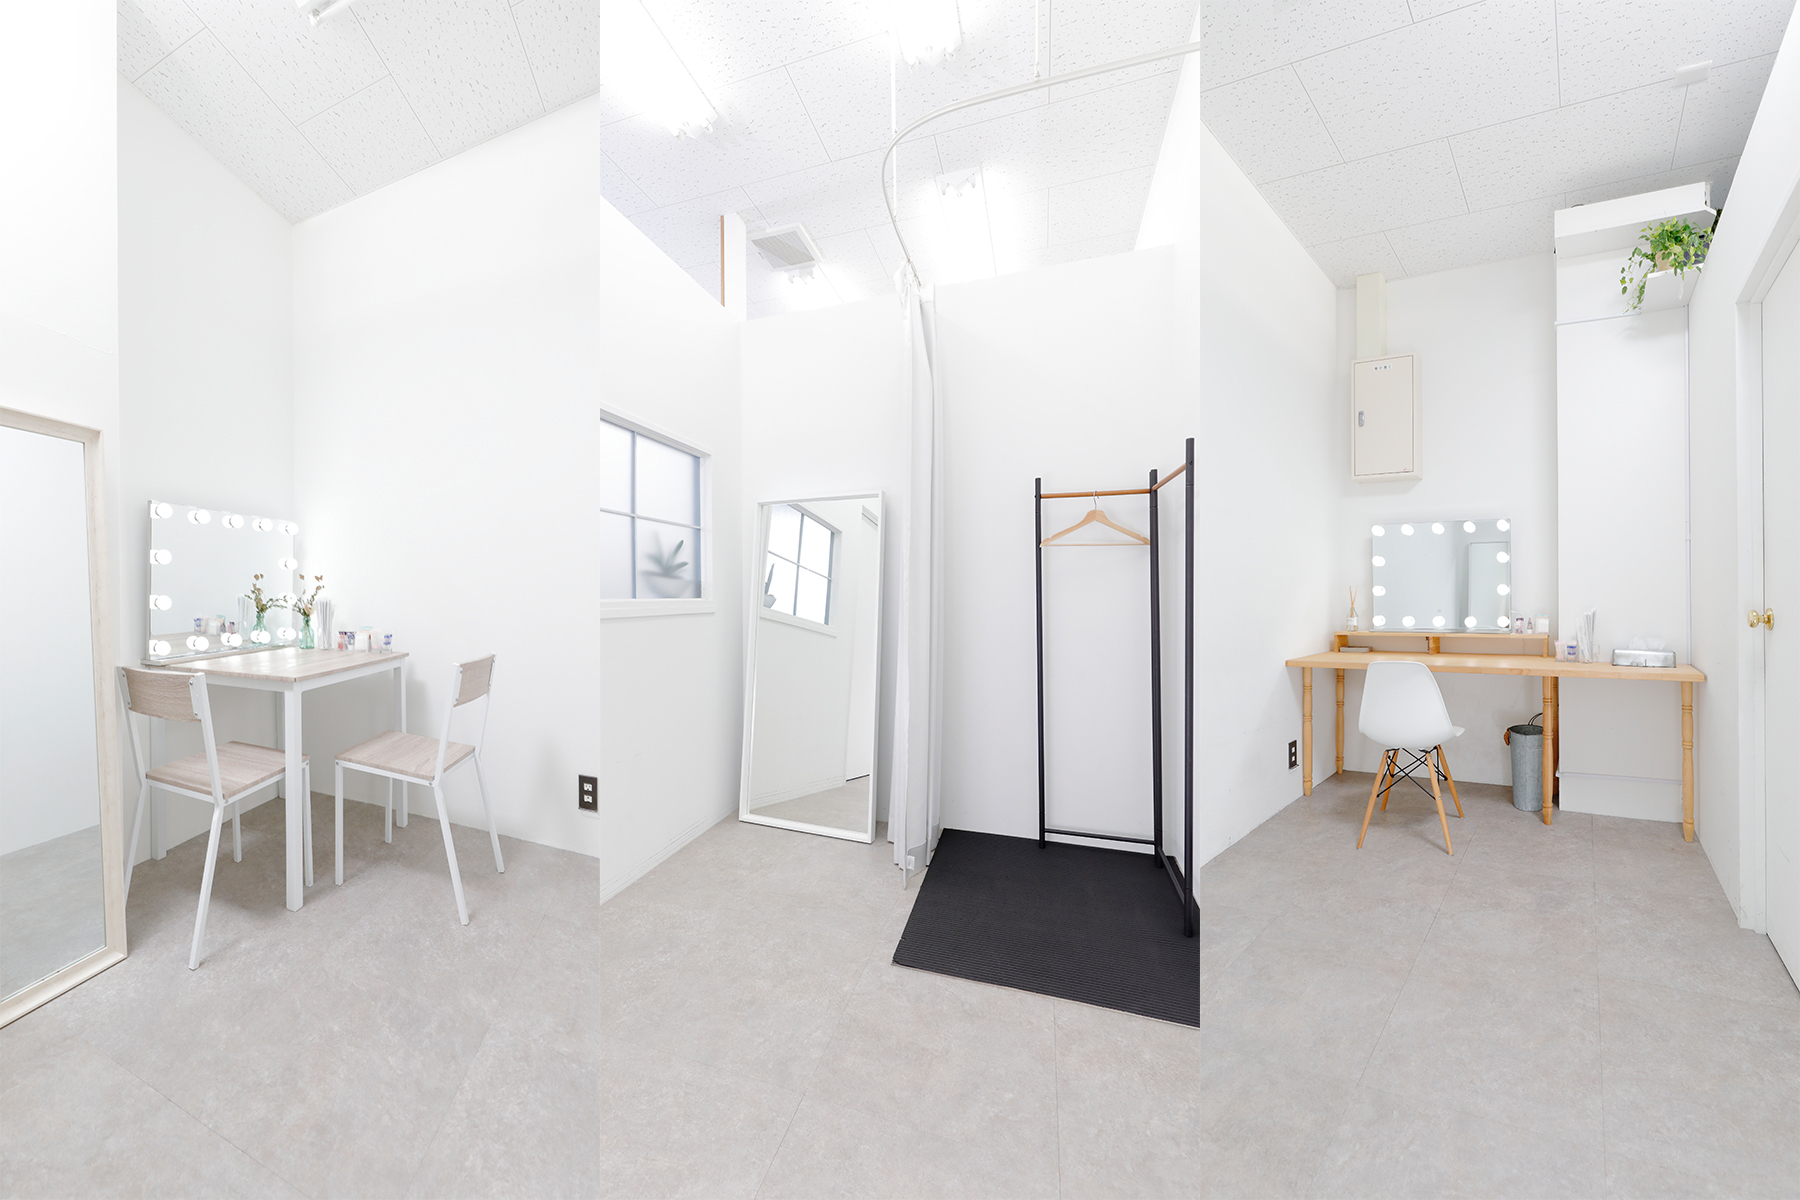 STUDIO TWOBEE  (スタジオ トゥービー)ヘアメイクスペースと個室控室